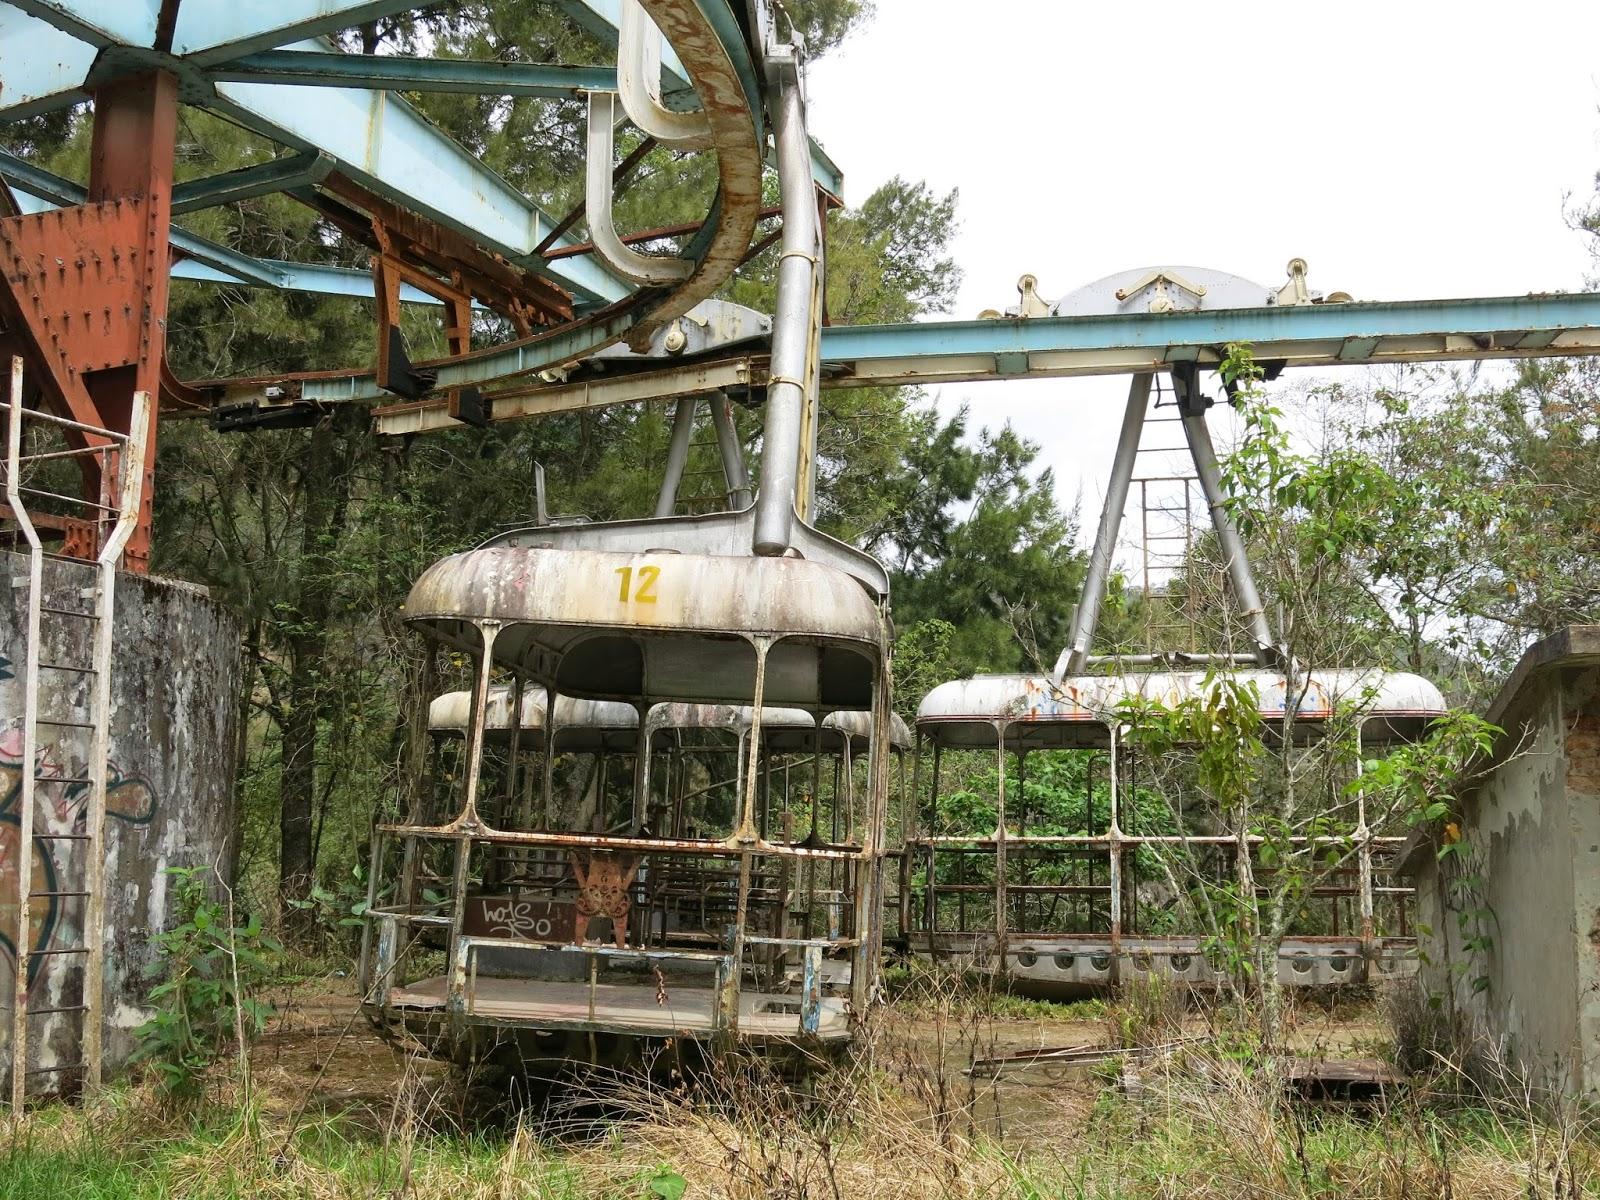 Al estilo majarete: Ruta #1: Las cabinas del tiempo